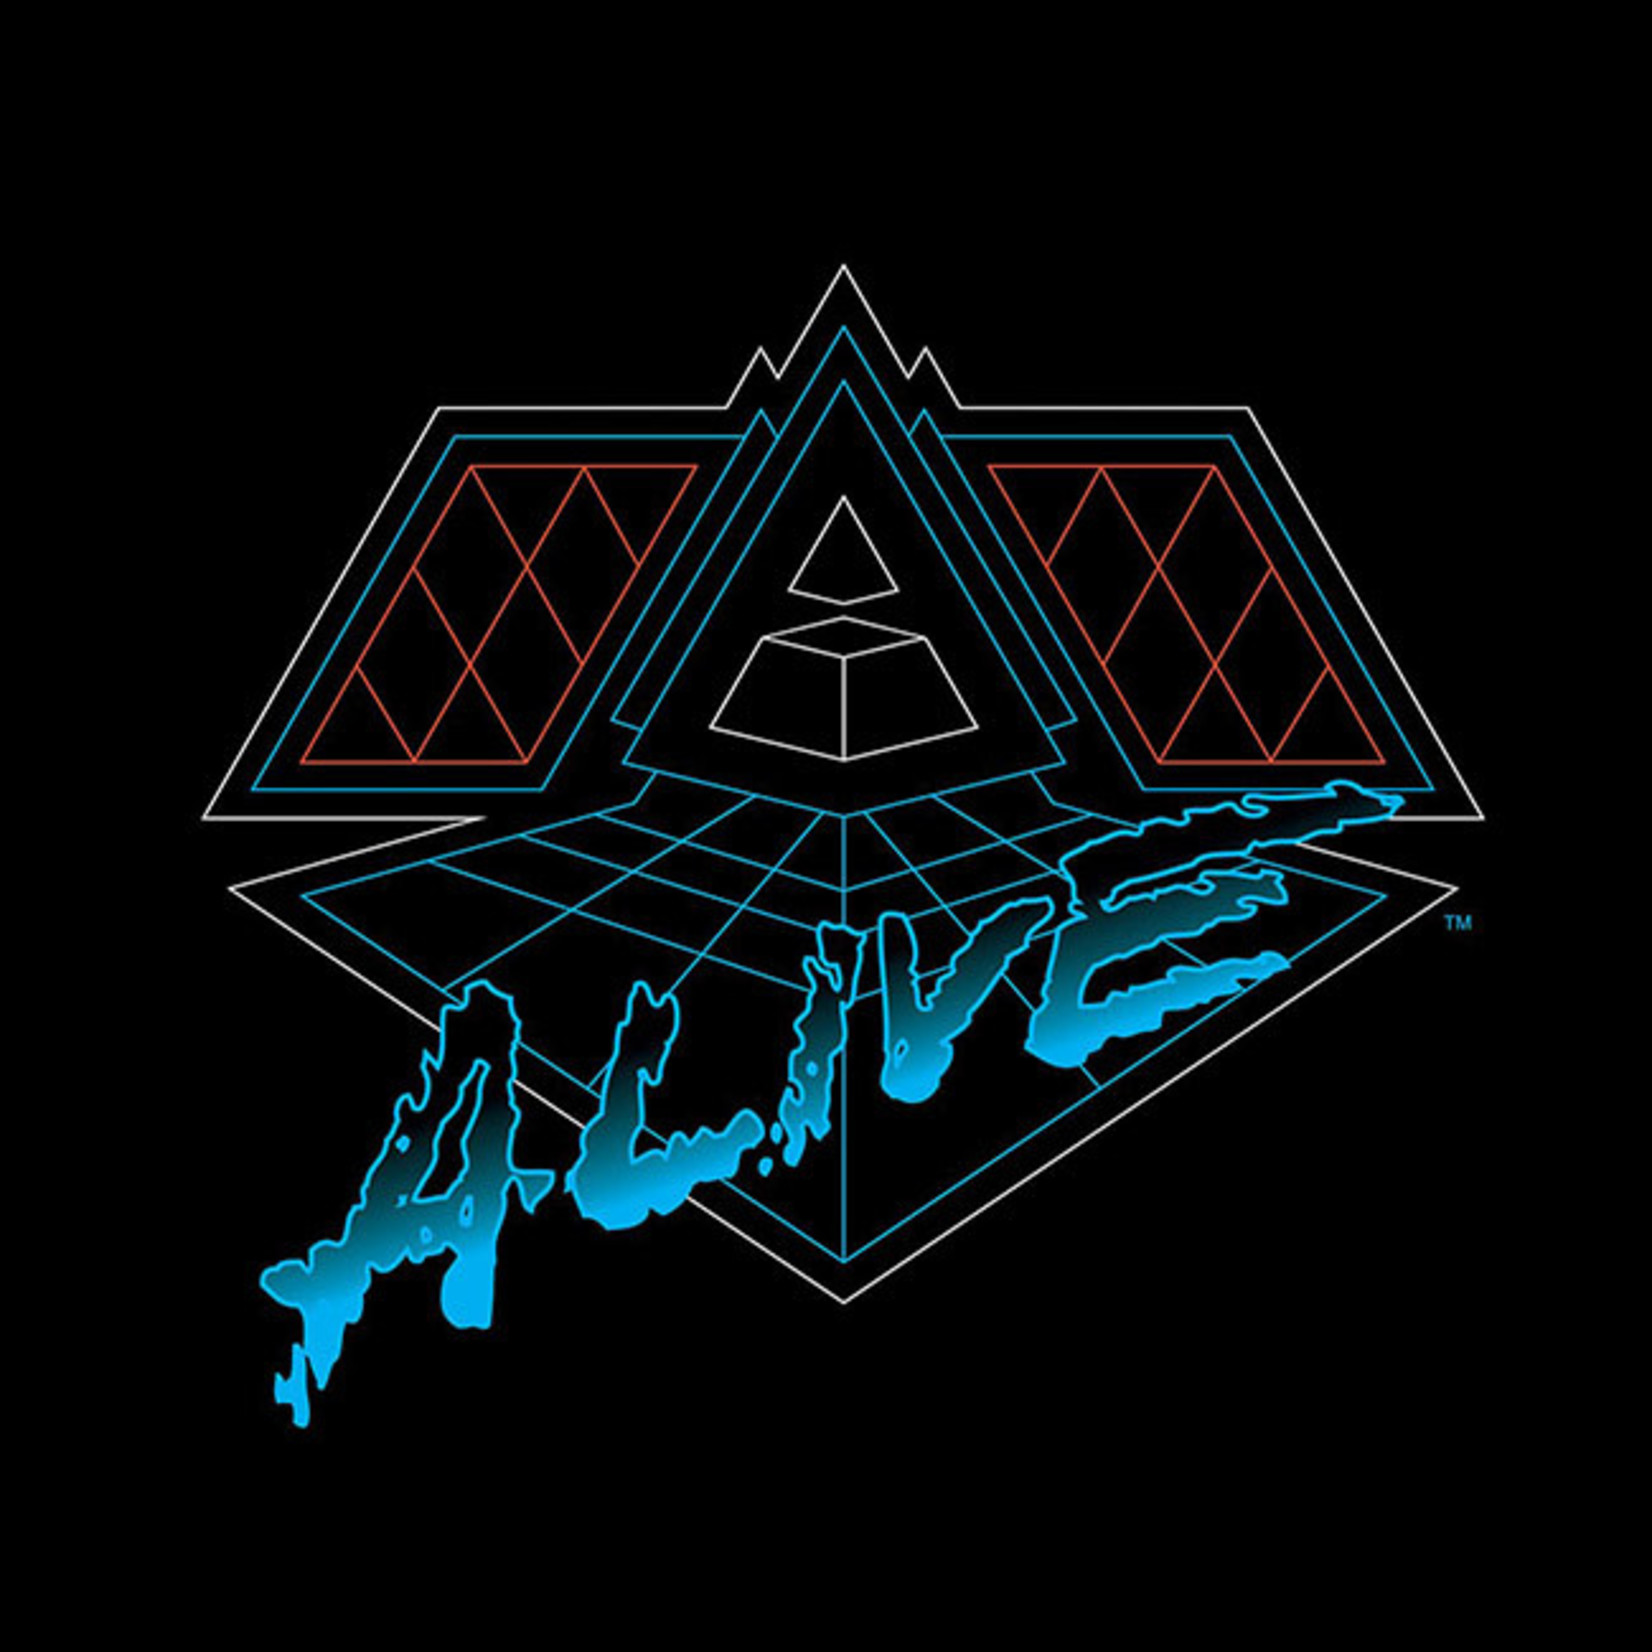 [New] Daft Punk: Alive 2007 (2LP, 180g)